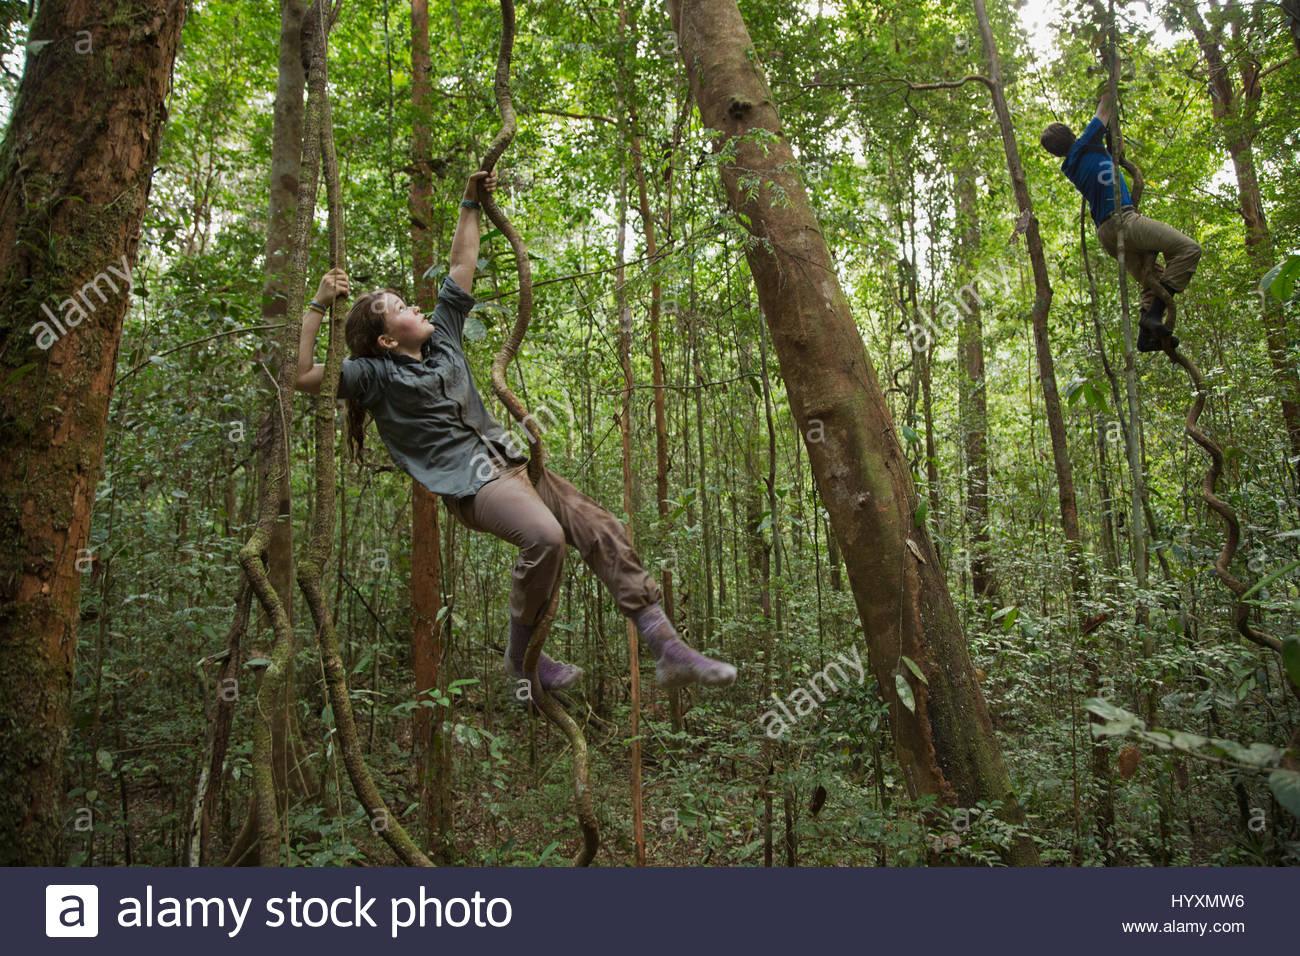 Teenagers climb lianas in Gunung Palung National Park. - Stock Image